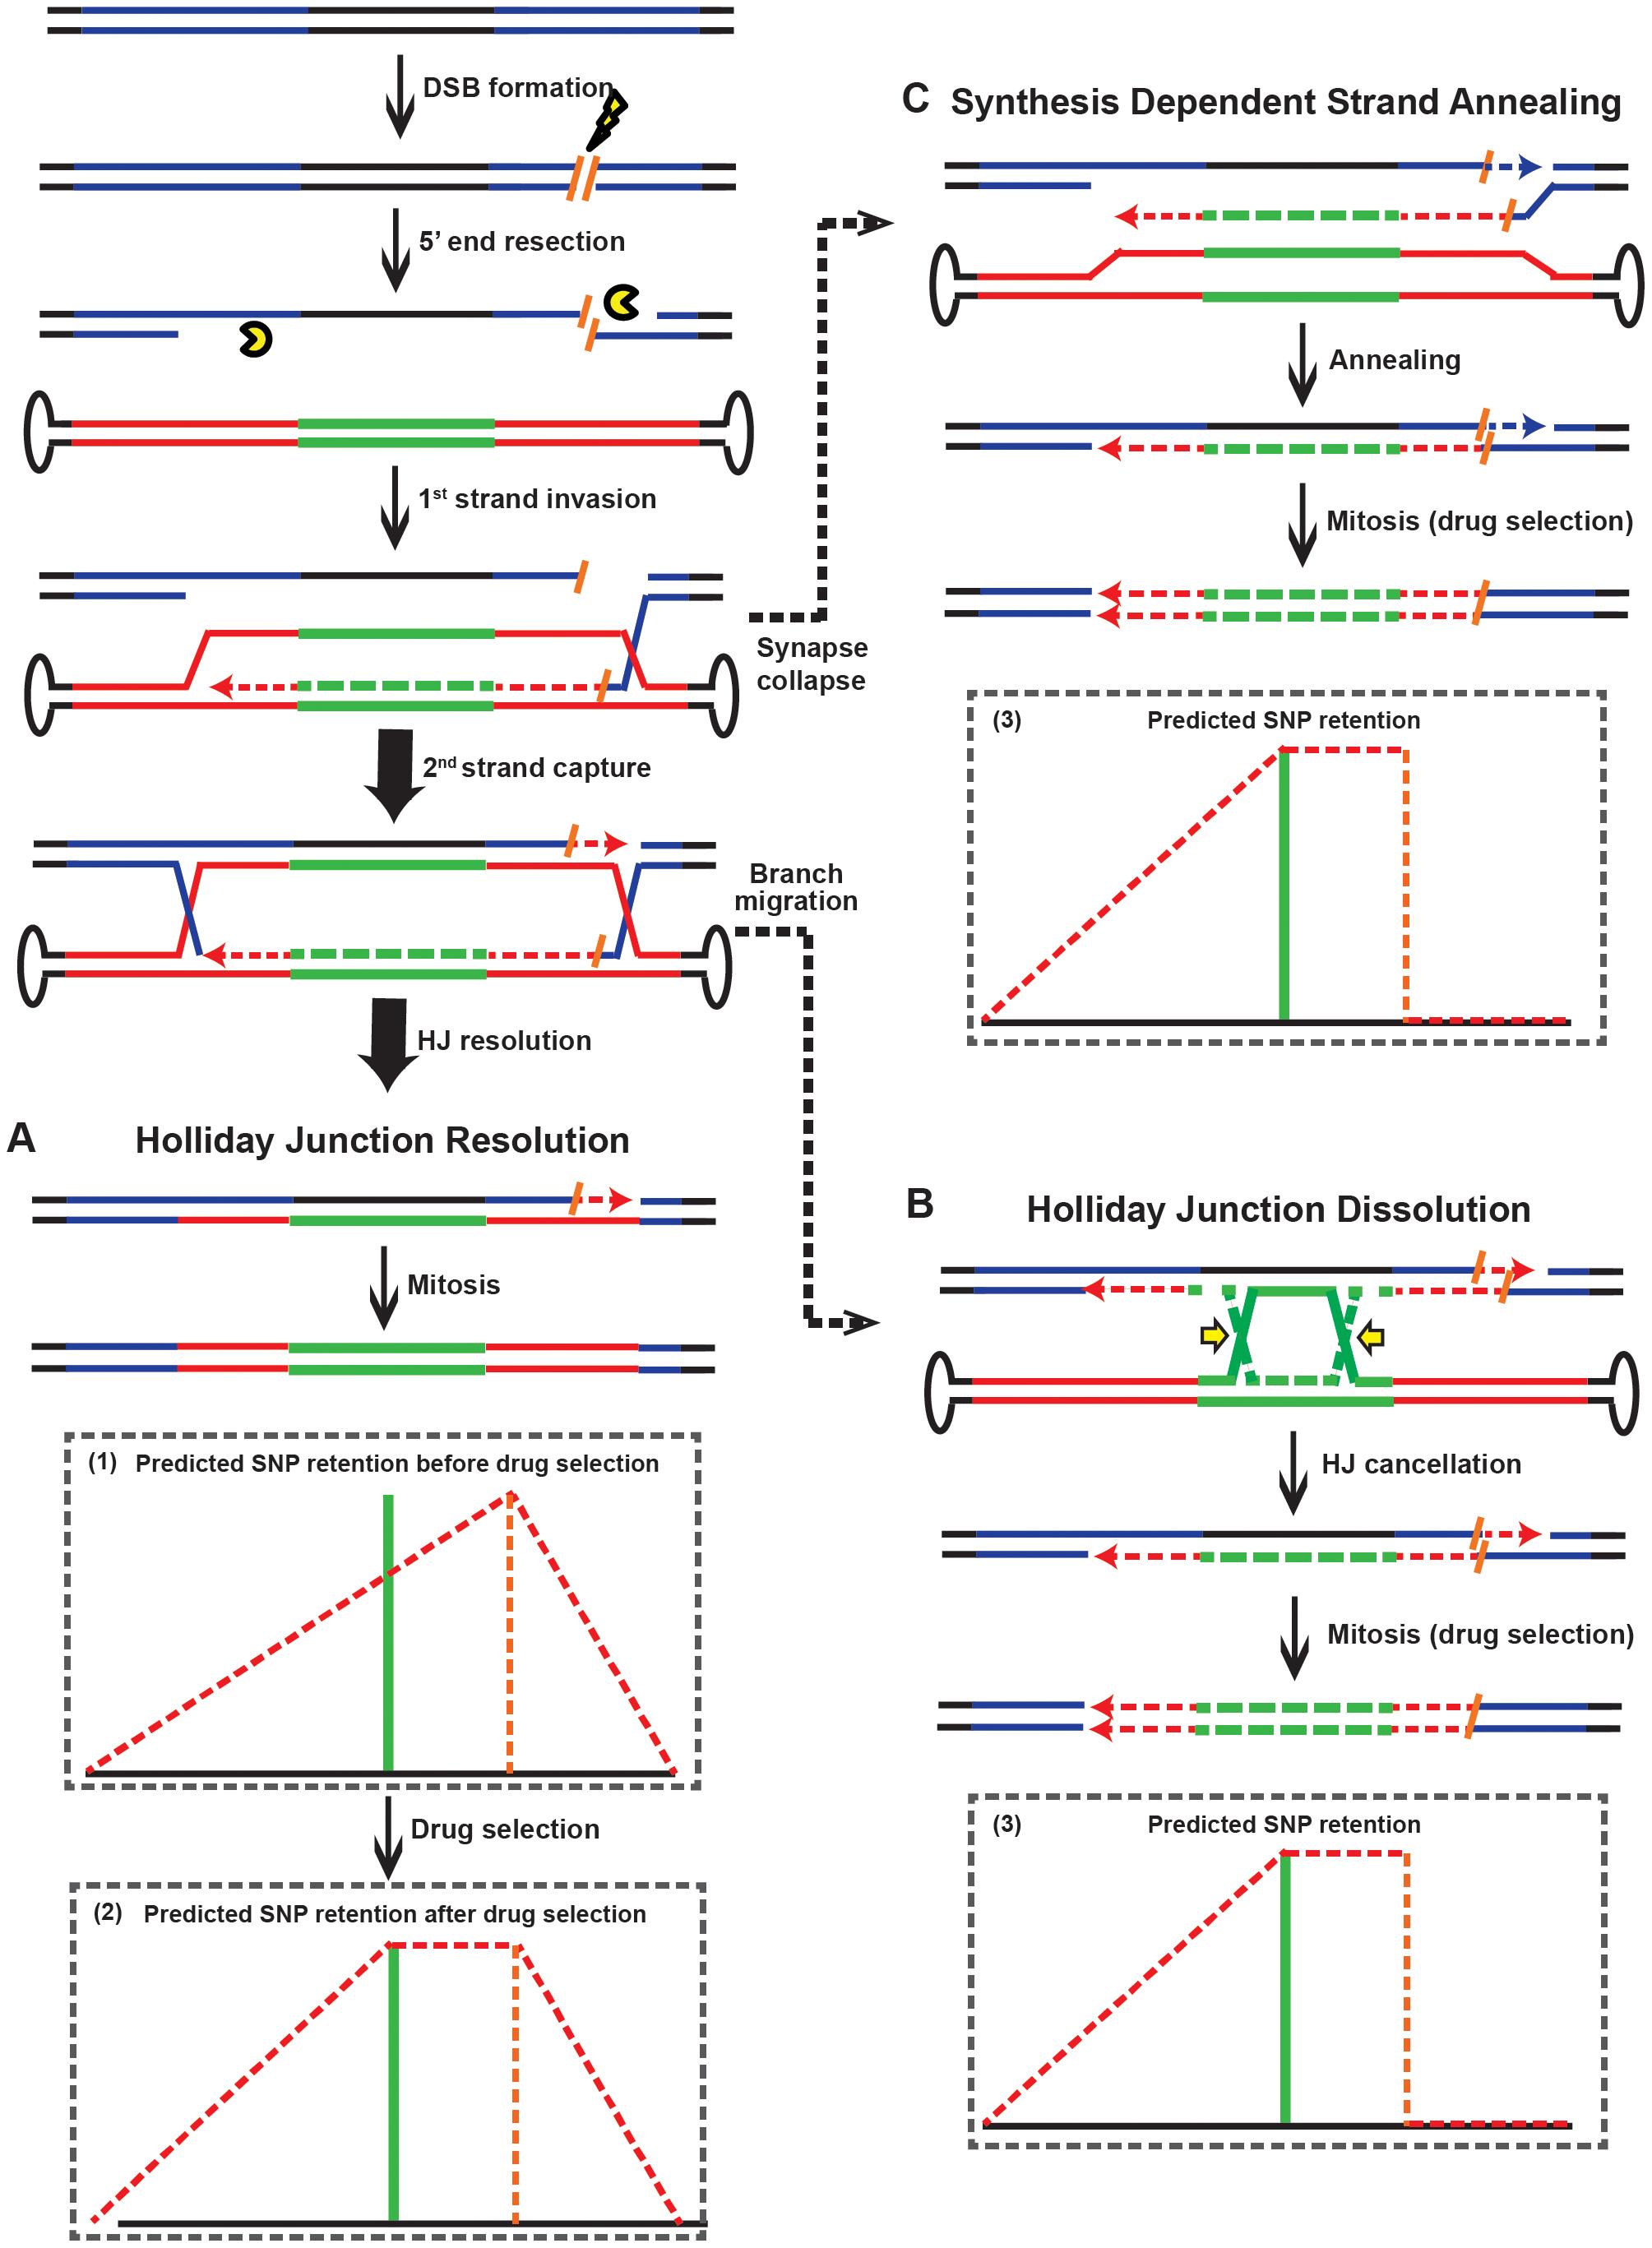 Models for rAAV gene targeting in the presence of DSBs.